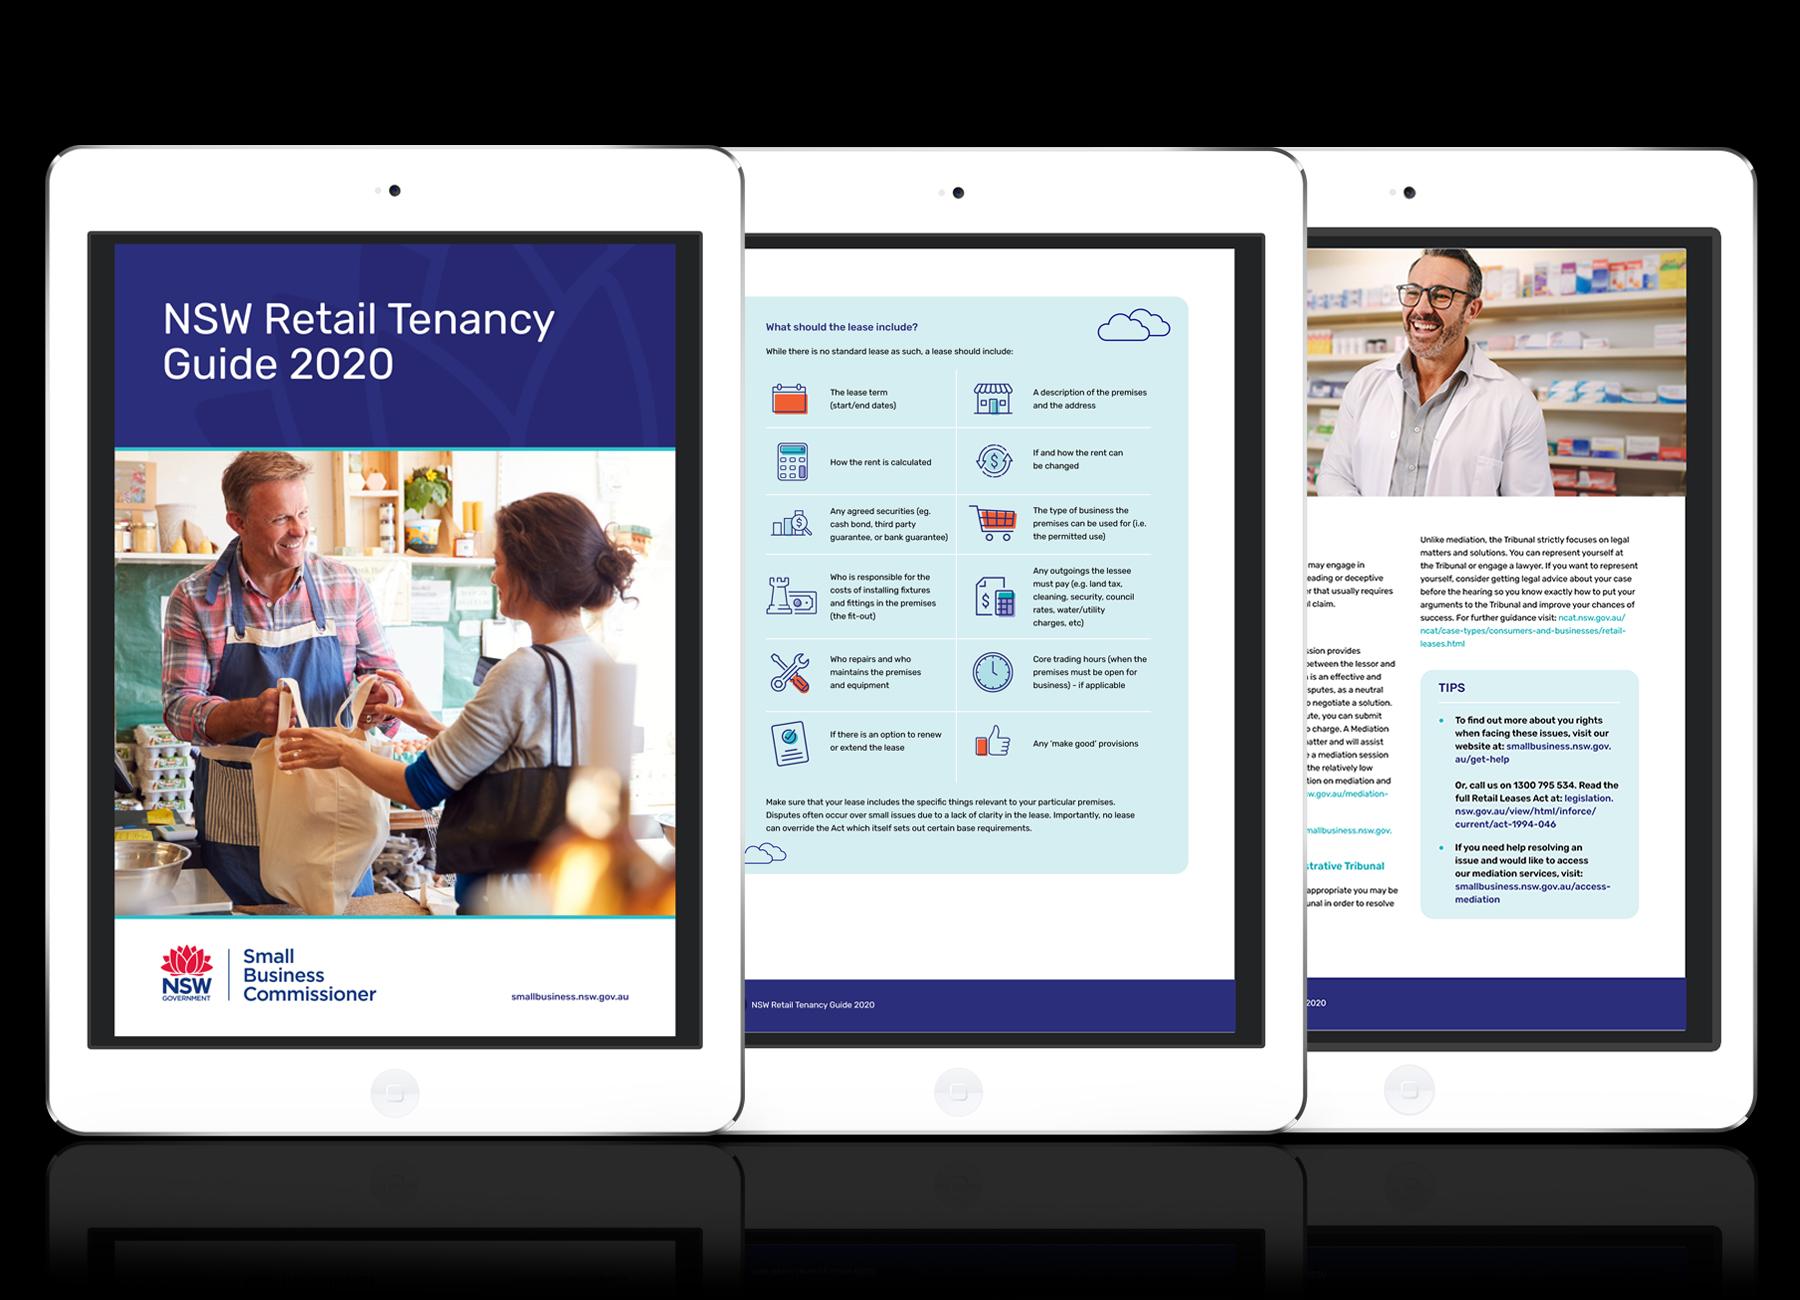 NSW retail tenancy guide 2020